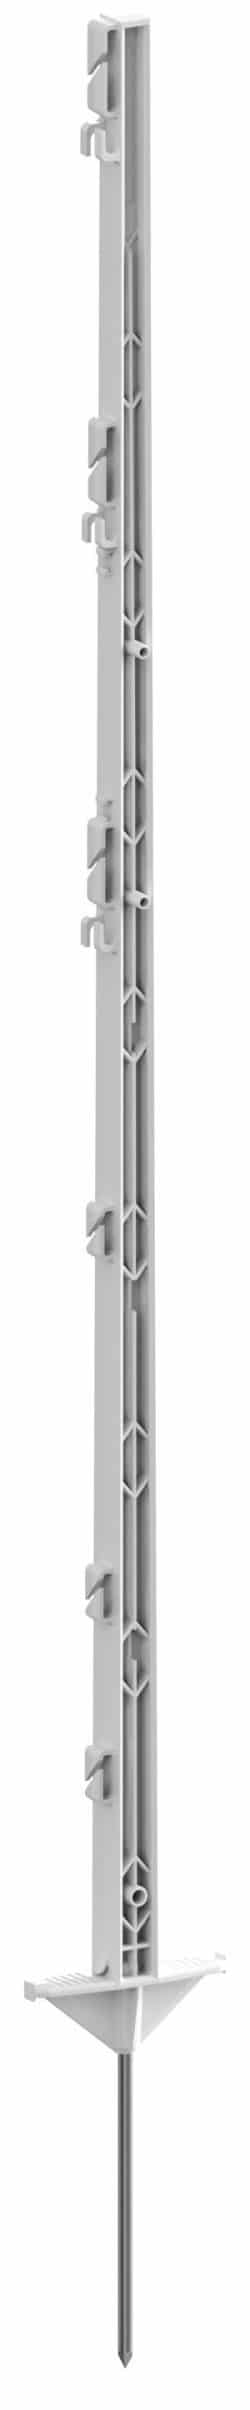 Plaststolpe 1550mm Vit - 89508148 - Stolpar